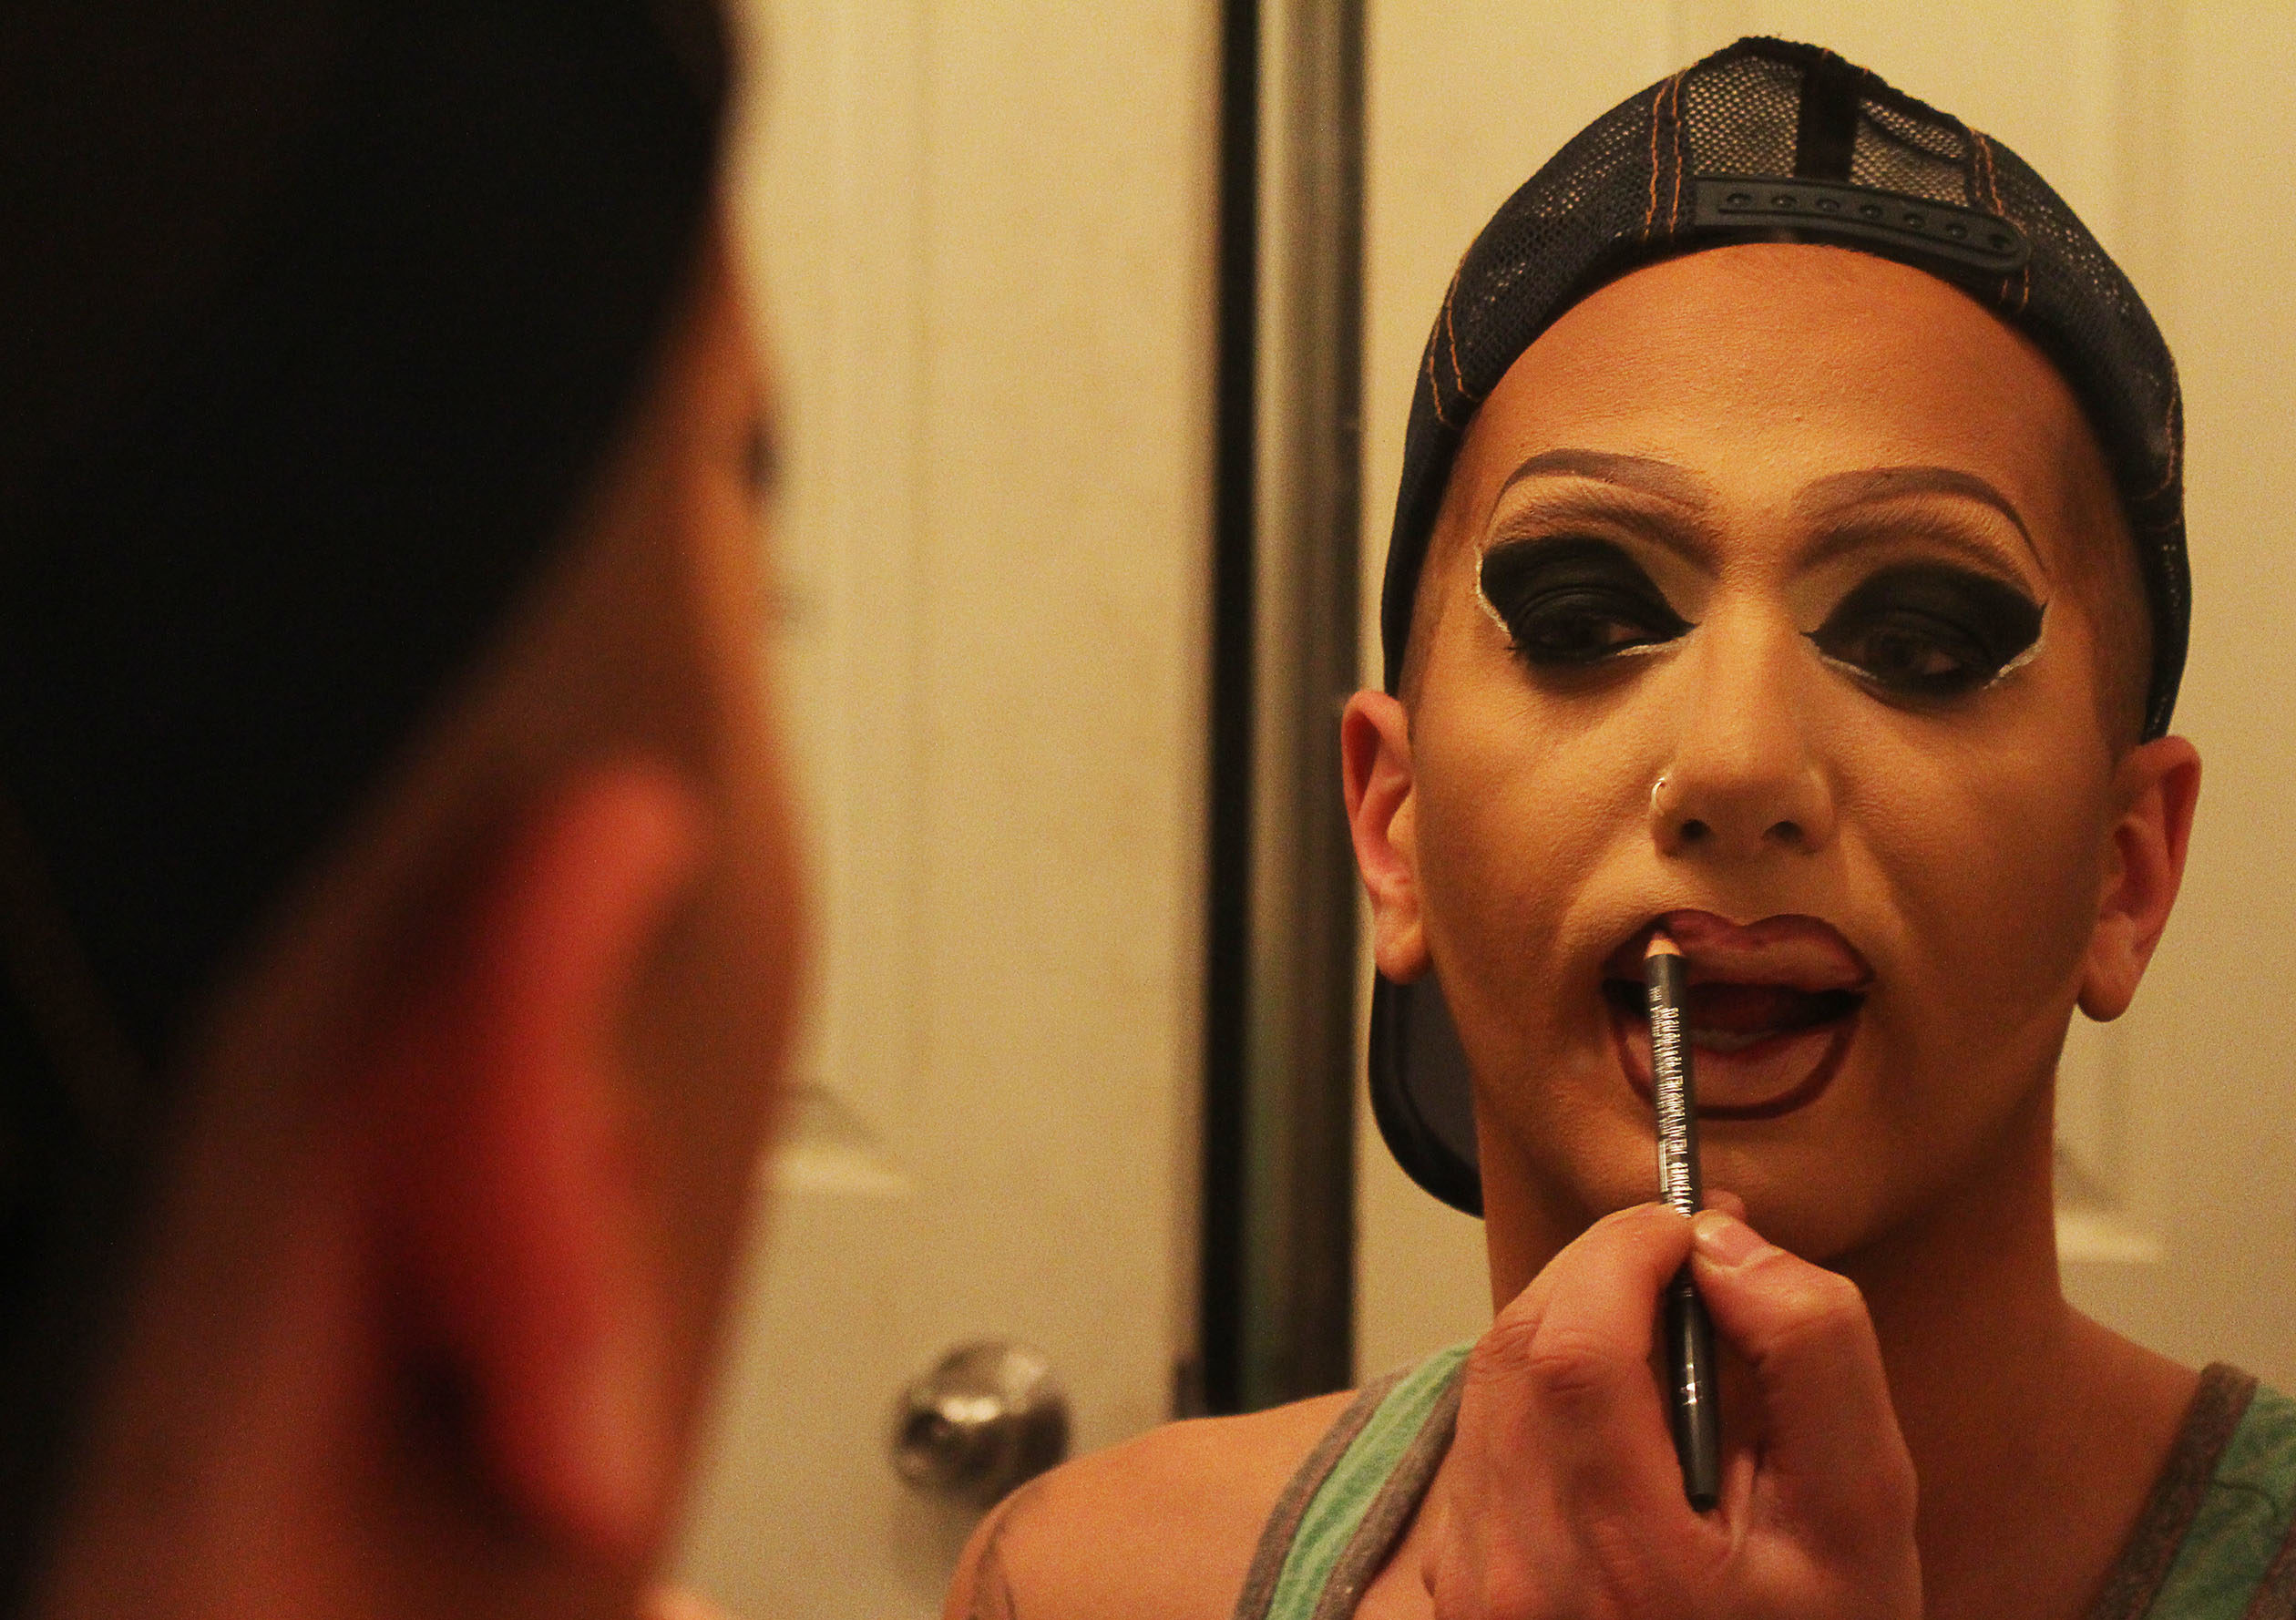 Matty Cameron applying makeup in the mirror.